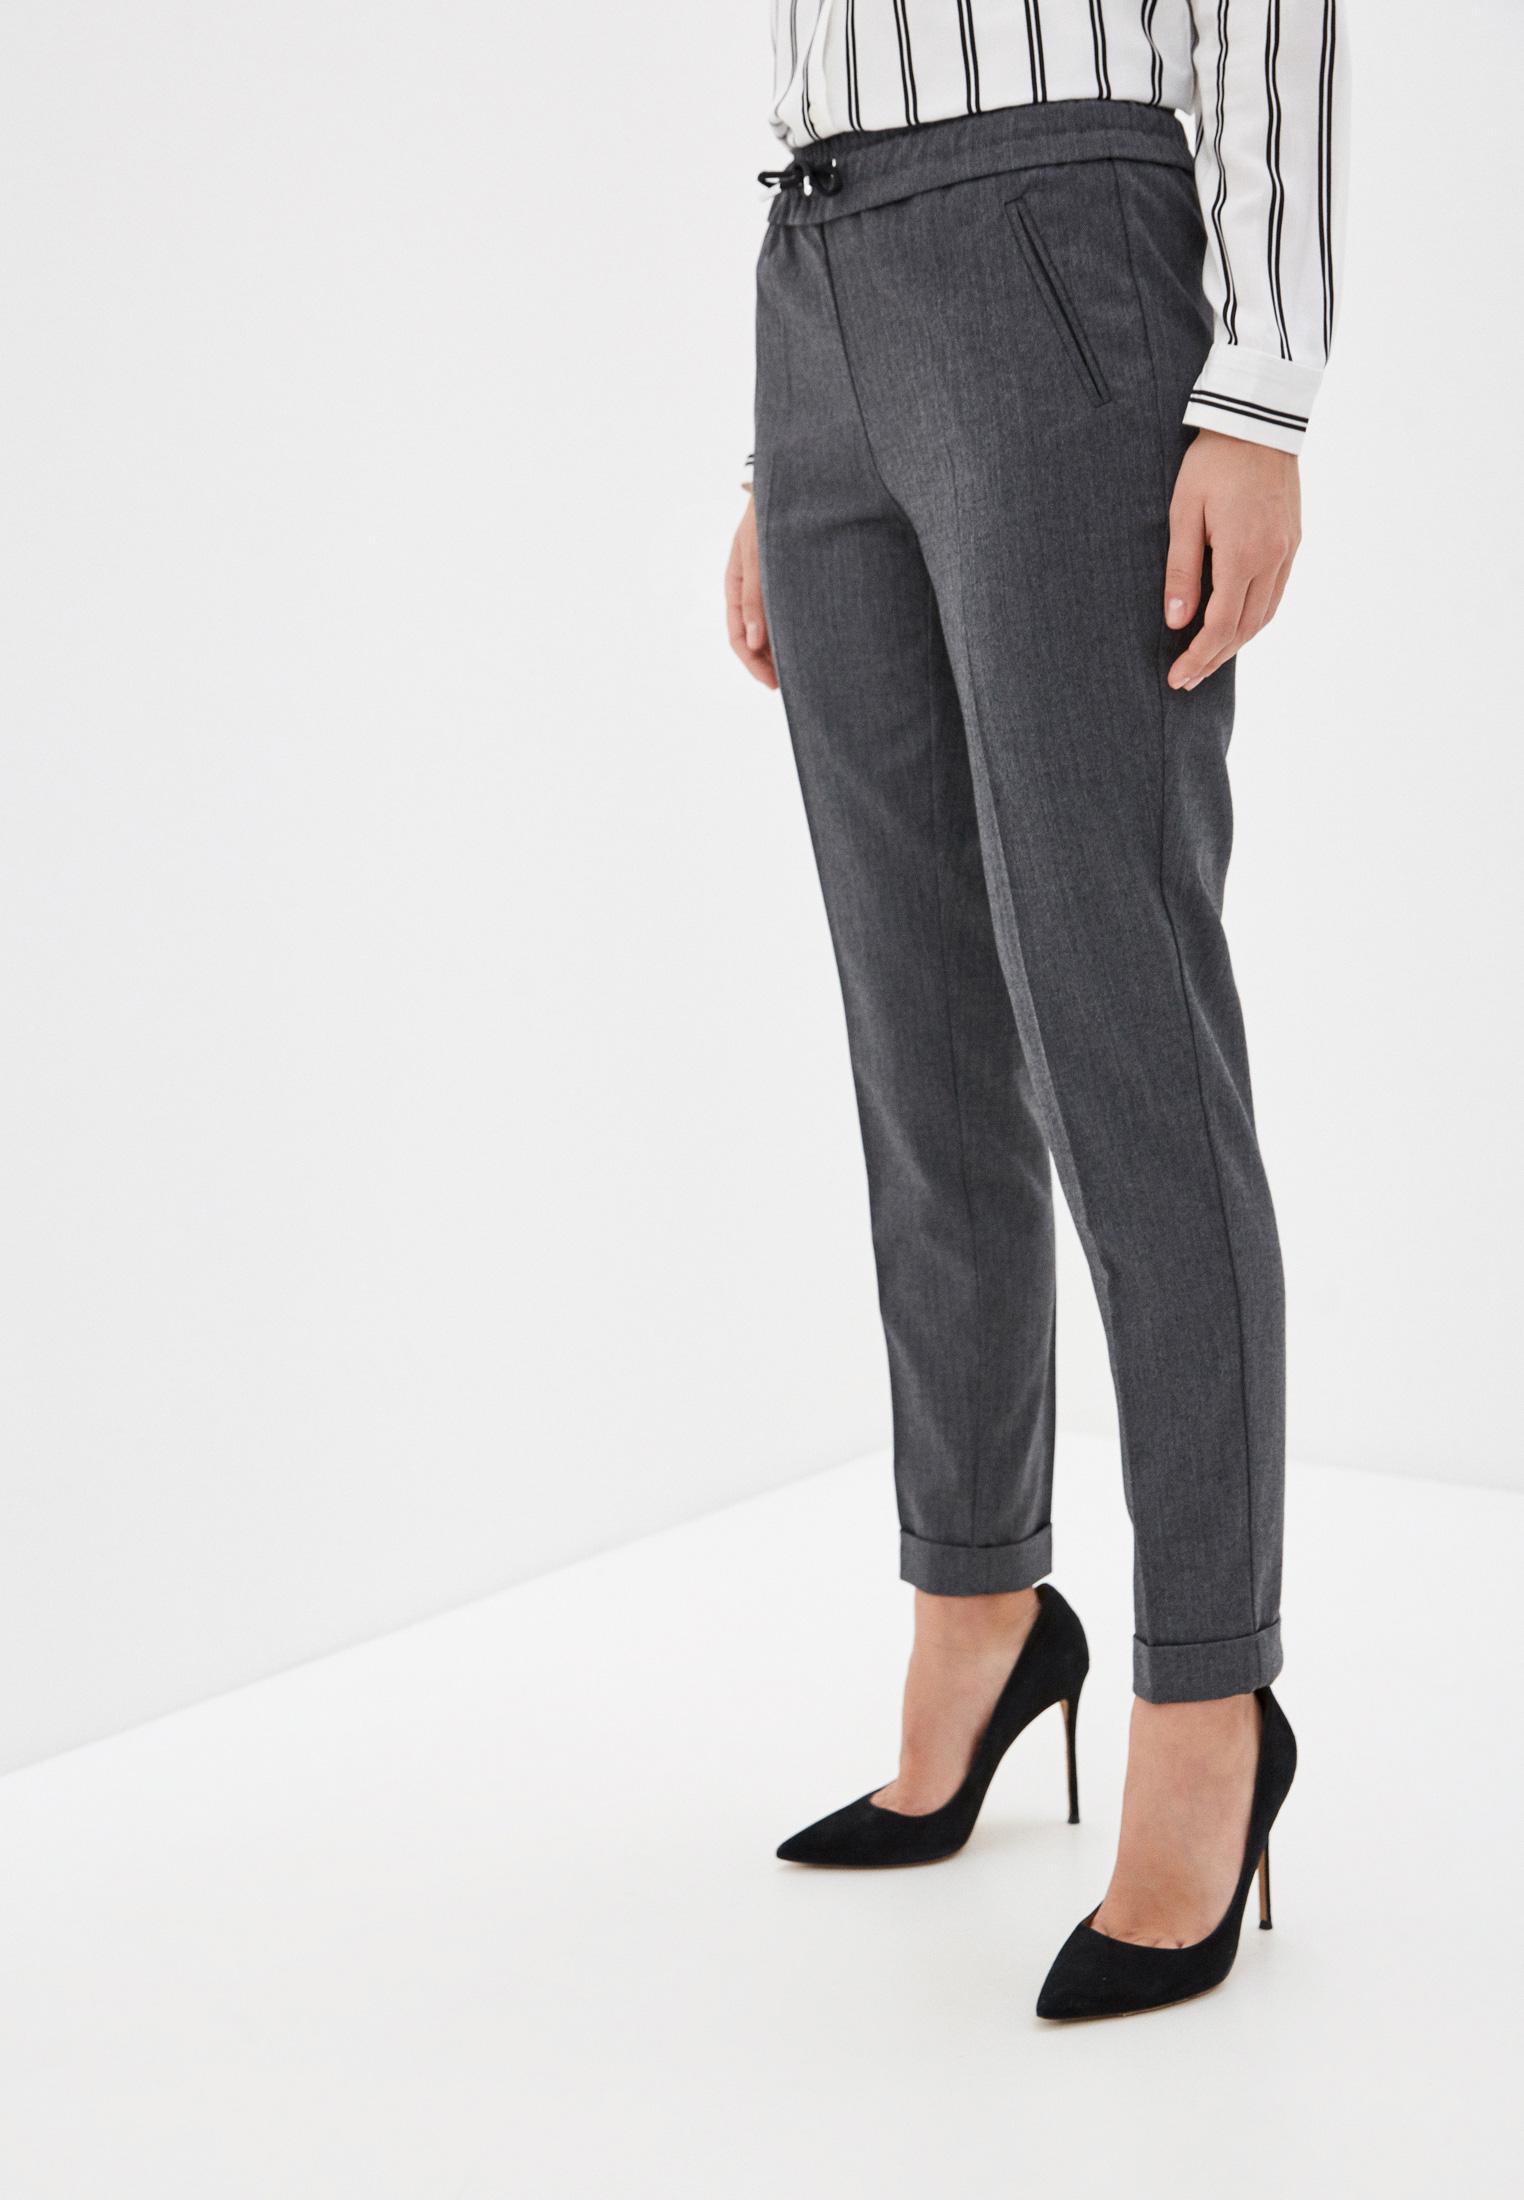 Женские классические брюки Pimkie 141049